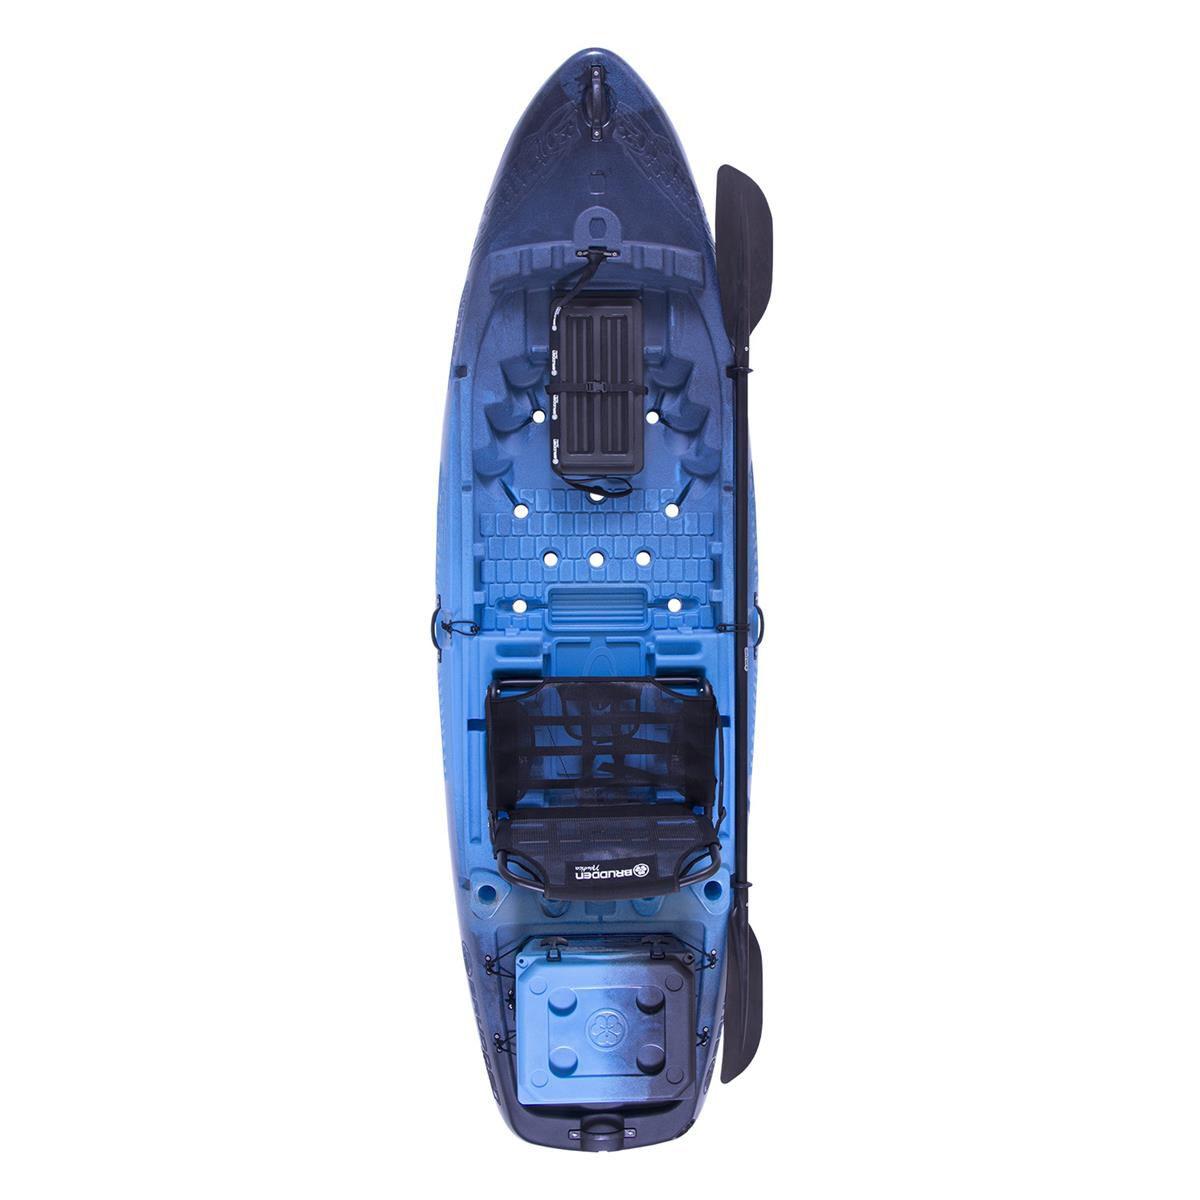 Caiaque para Pesca Brudden Náutica Hunter Fishing 285 Combo Profissional Azul Safira com Cooler 15LT